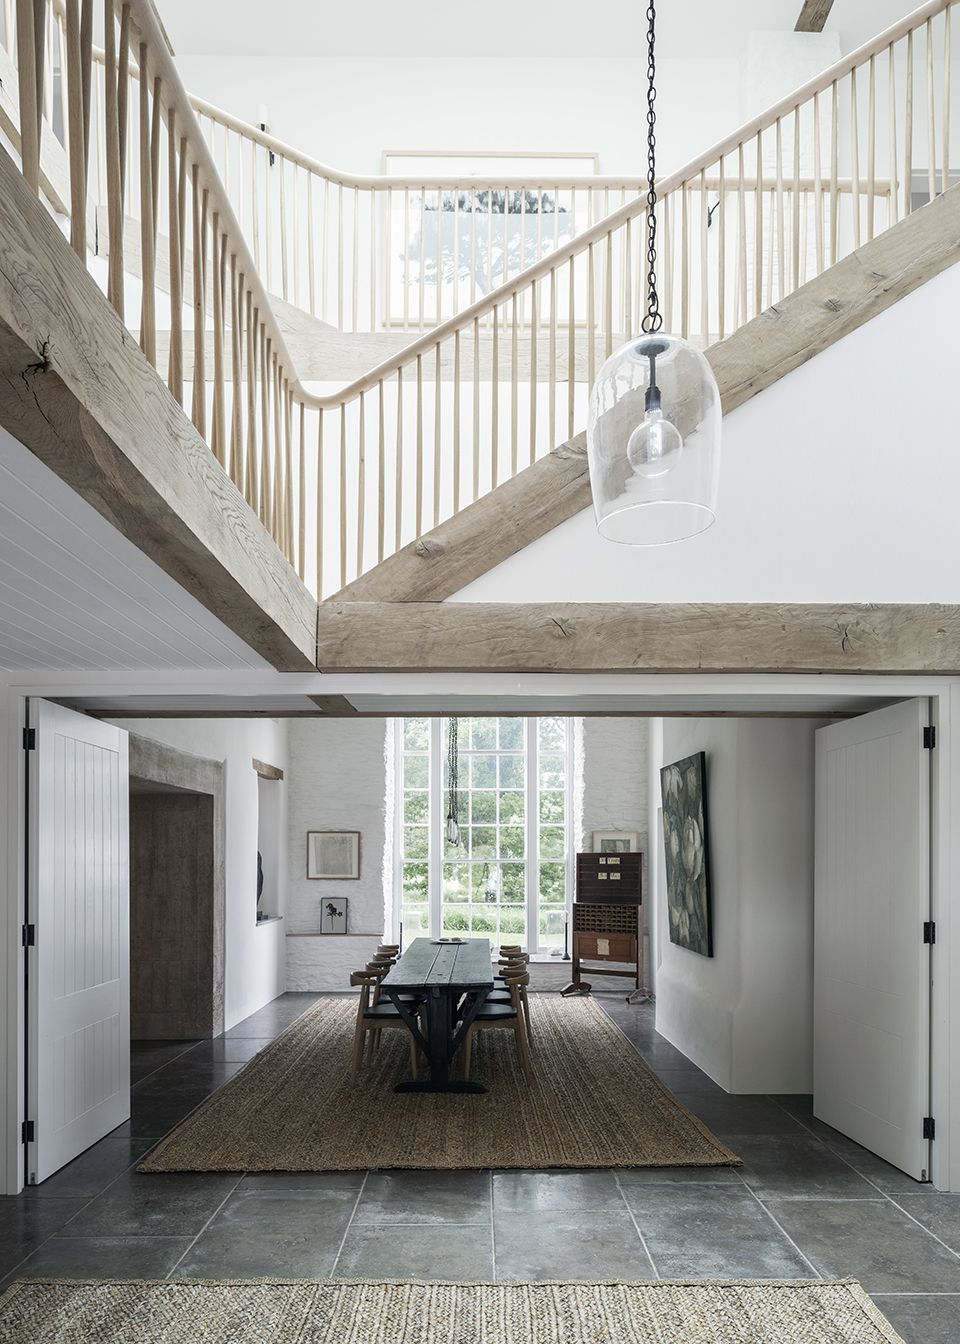 6a architects coastal house devon 7 house interiors diseño